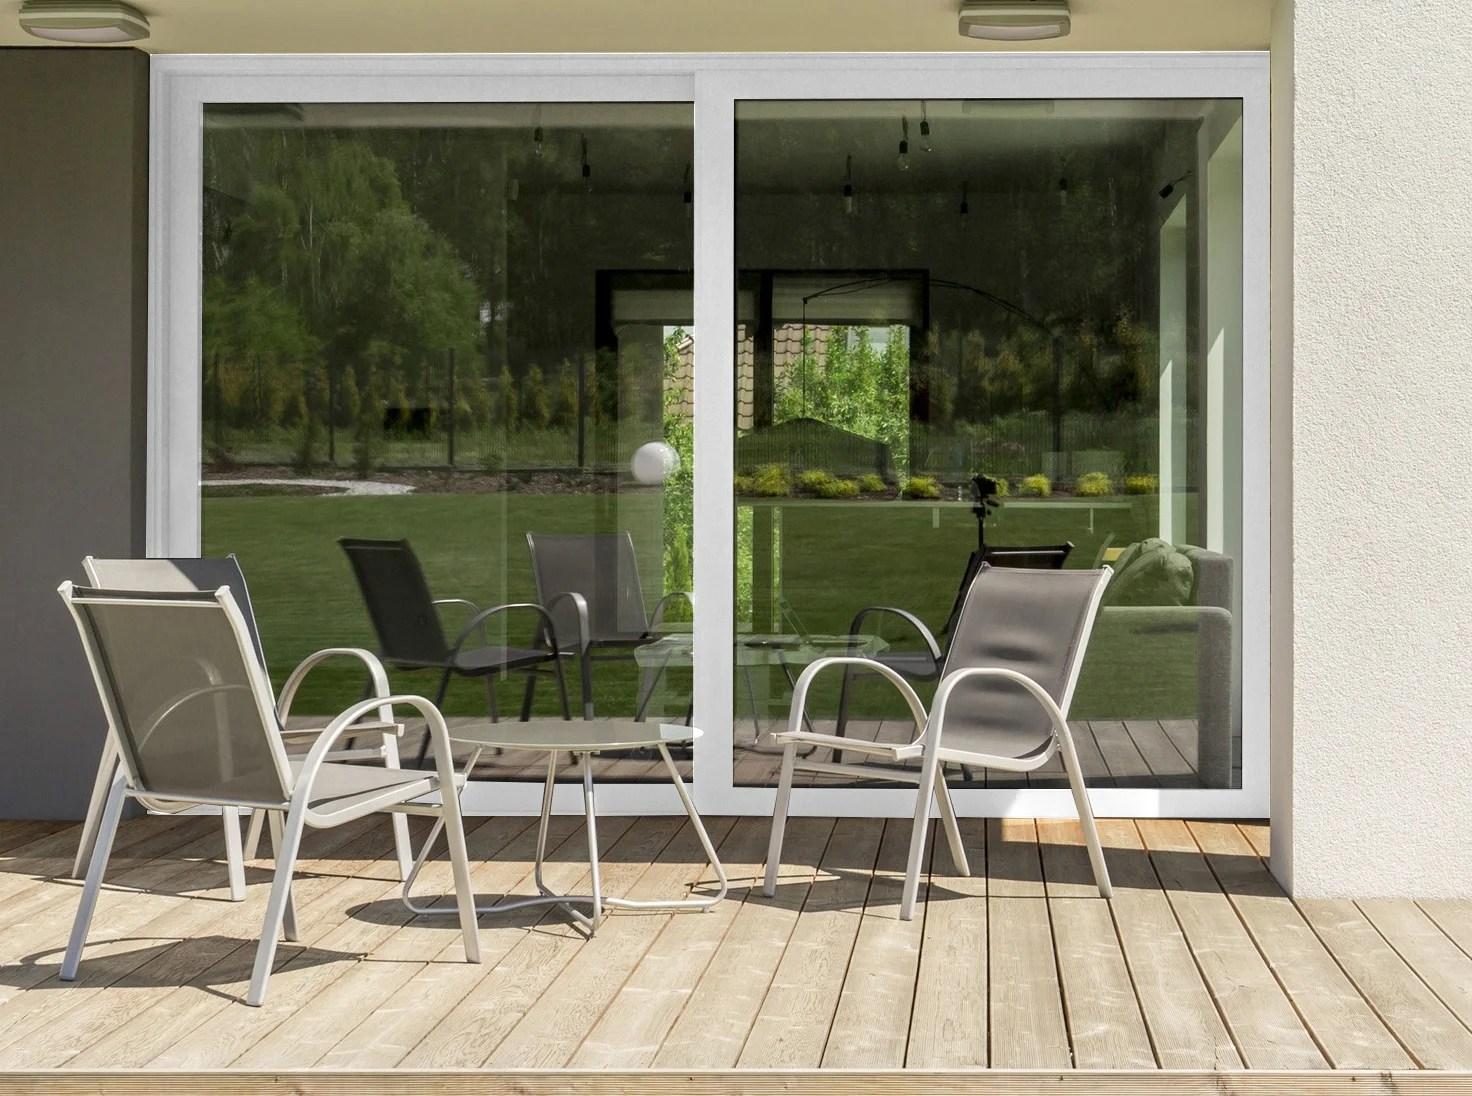 https www leroymerlin fr produits menuiserie baie vitree baie vitree coulissante baie vitree brico premium aluminium blanc avec volet roulant h 215 x l 240 cm 80137045 html